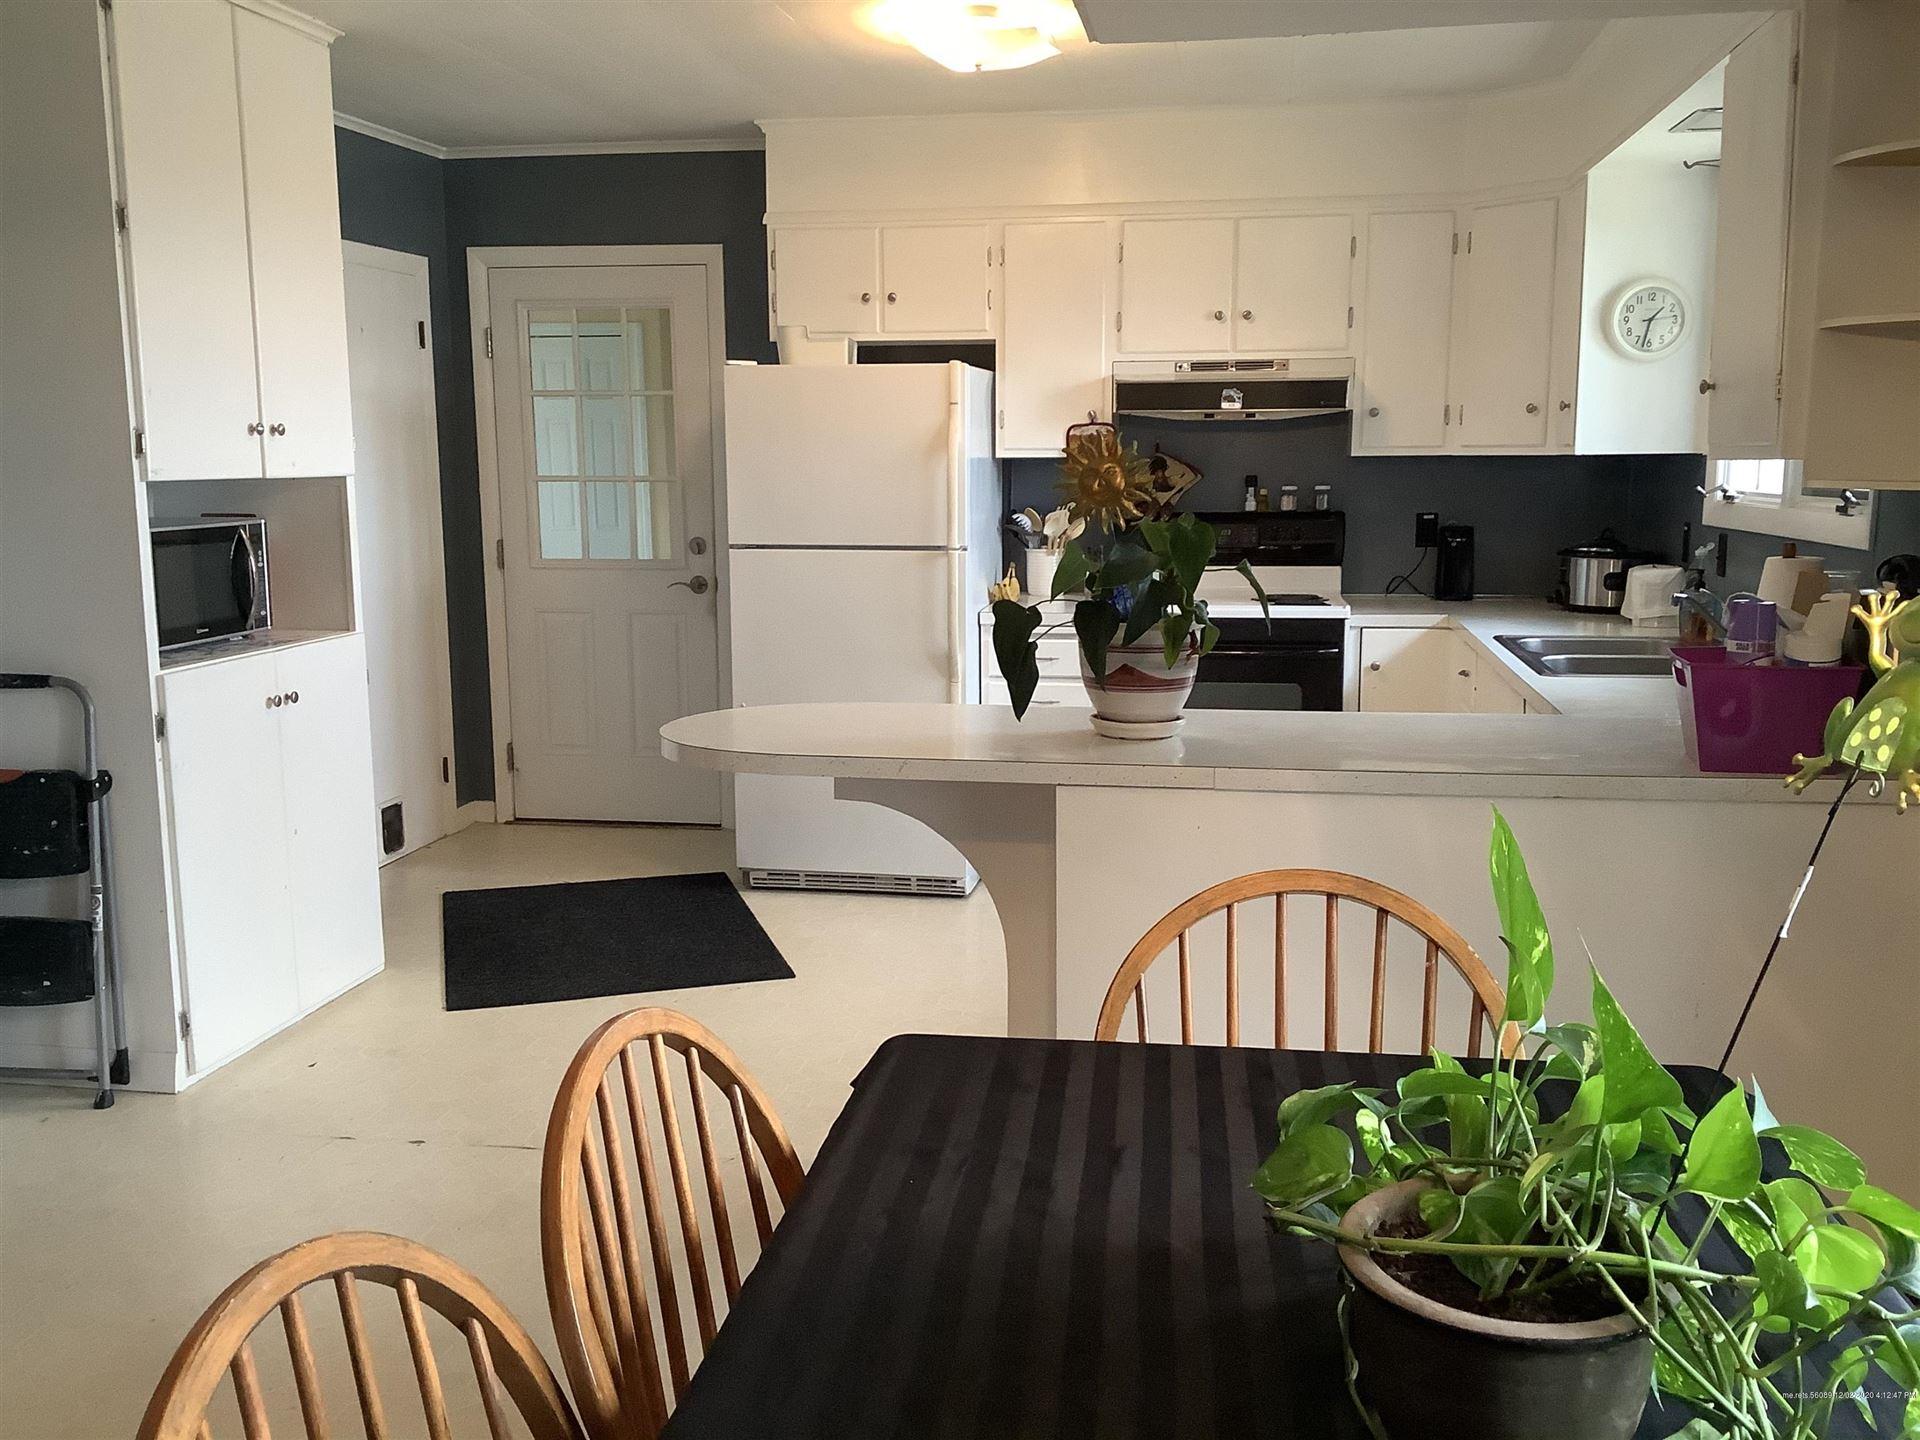 Photo of 402 Caribou Road, Presque Isle, ME 04769 (MLS # 1476568)